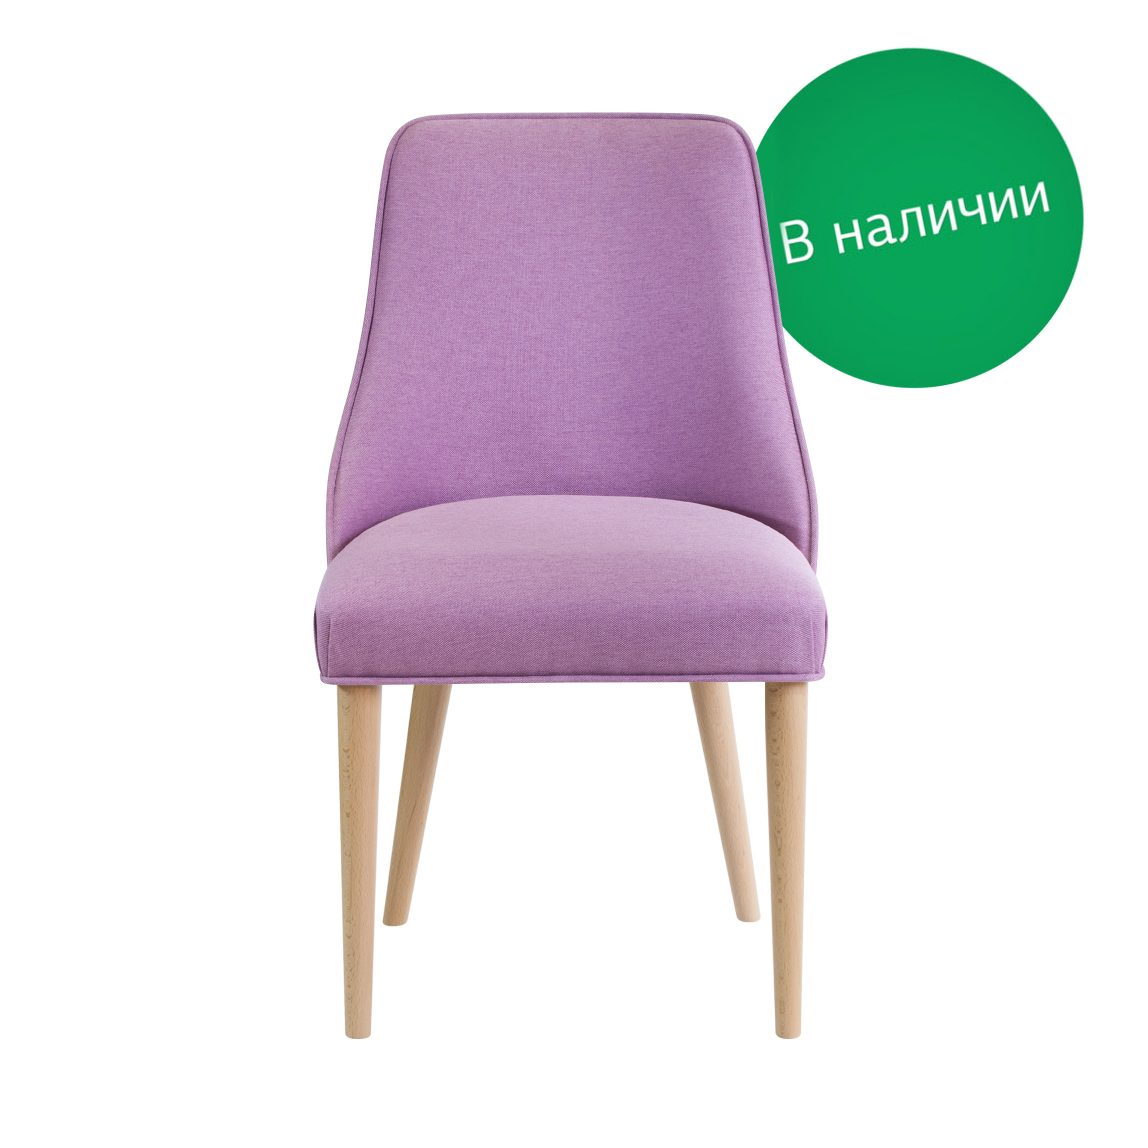 Скандинавский мягкий стул Чип в наличии